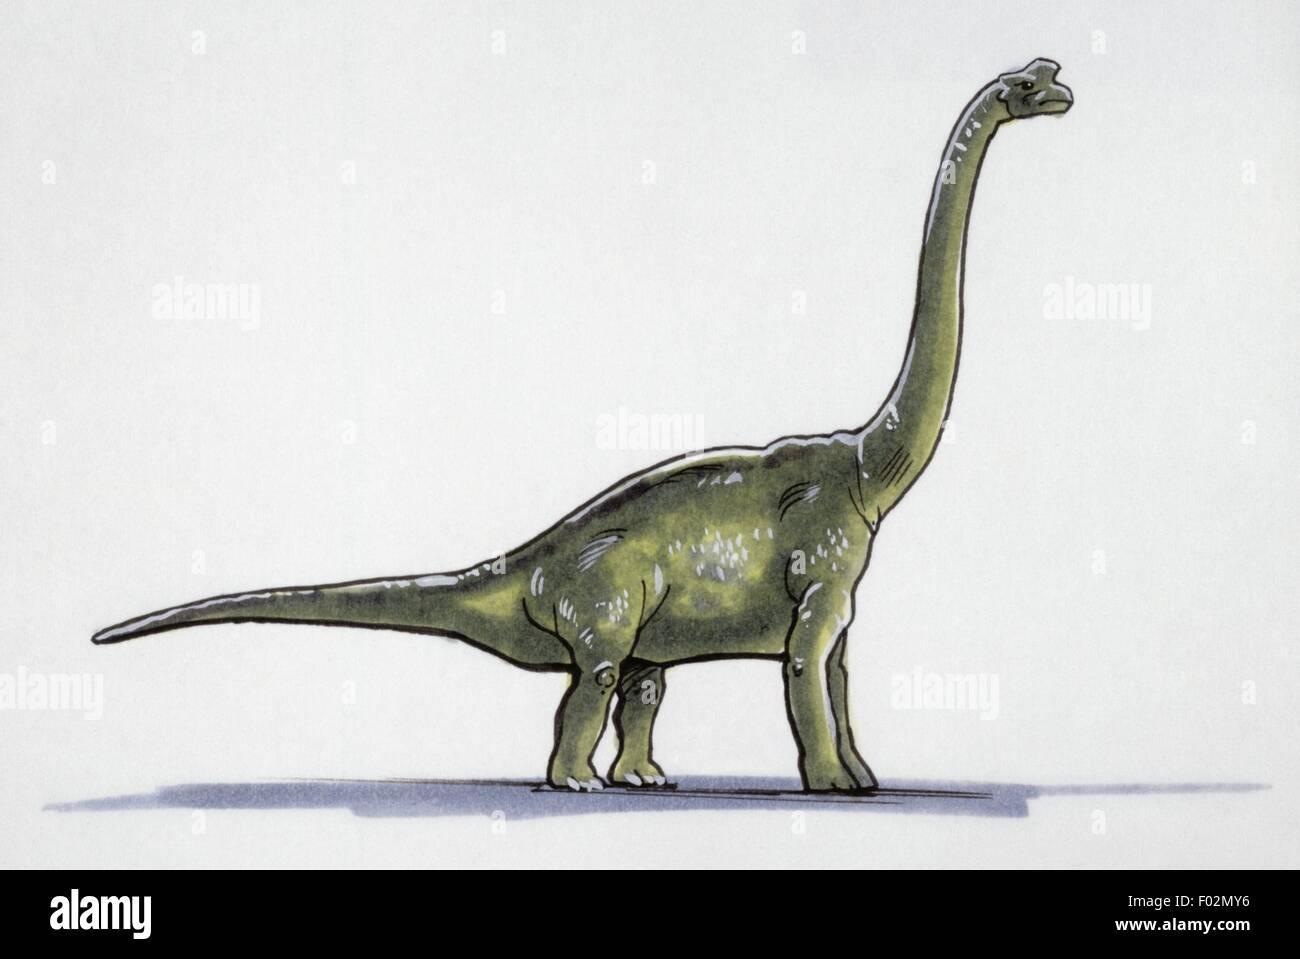 Zoopaleontologia - Giurassico - inosaurs - Damalasaurus - Disegno Immagini Stock